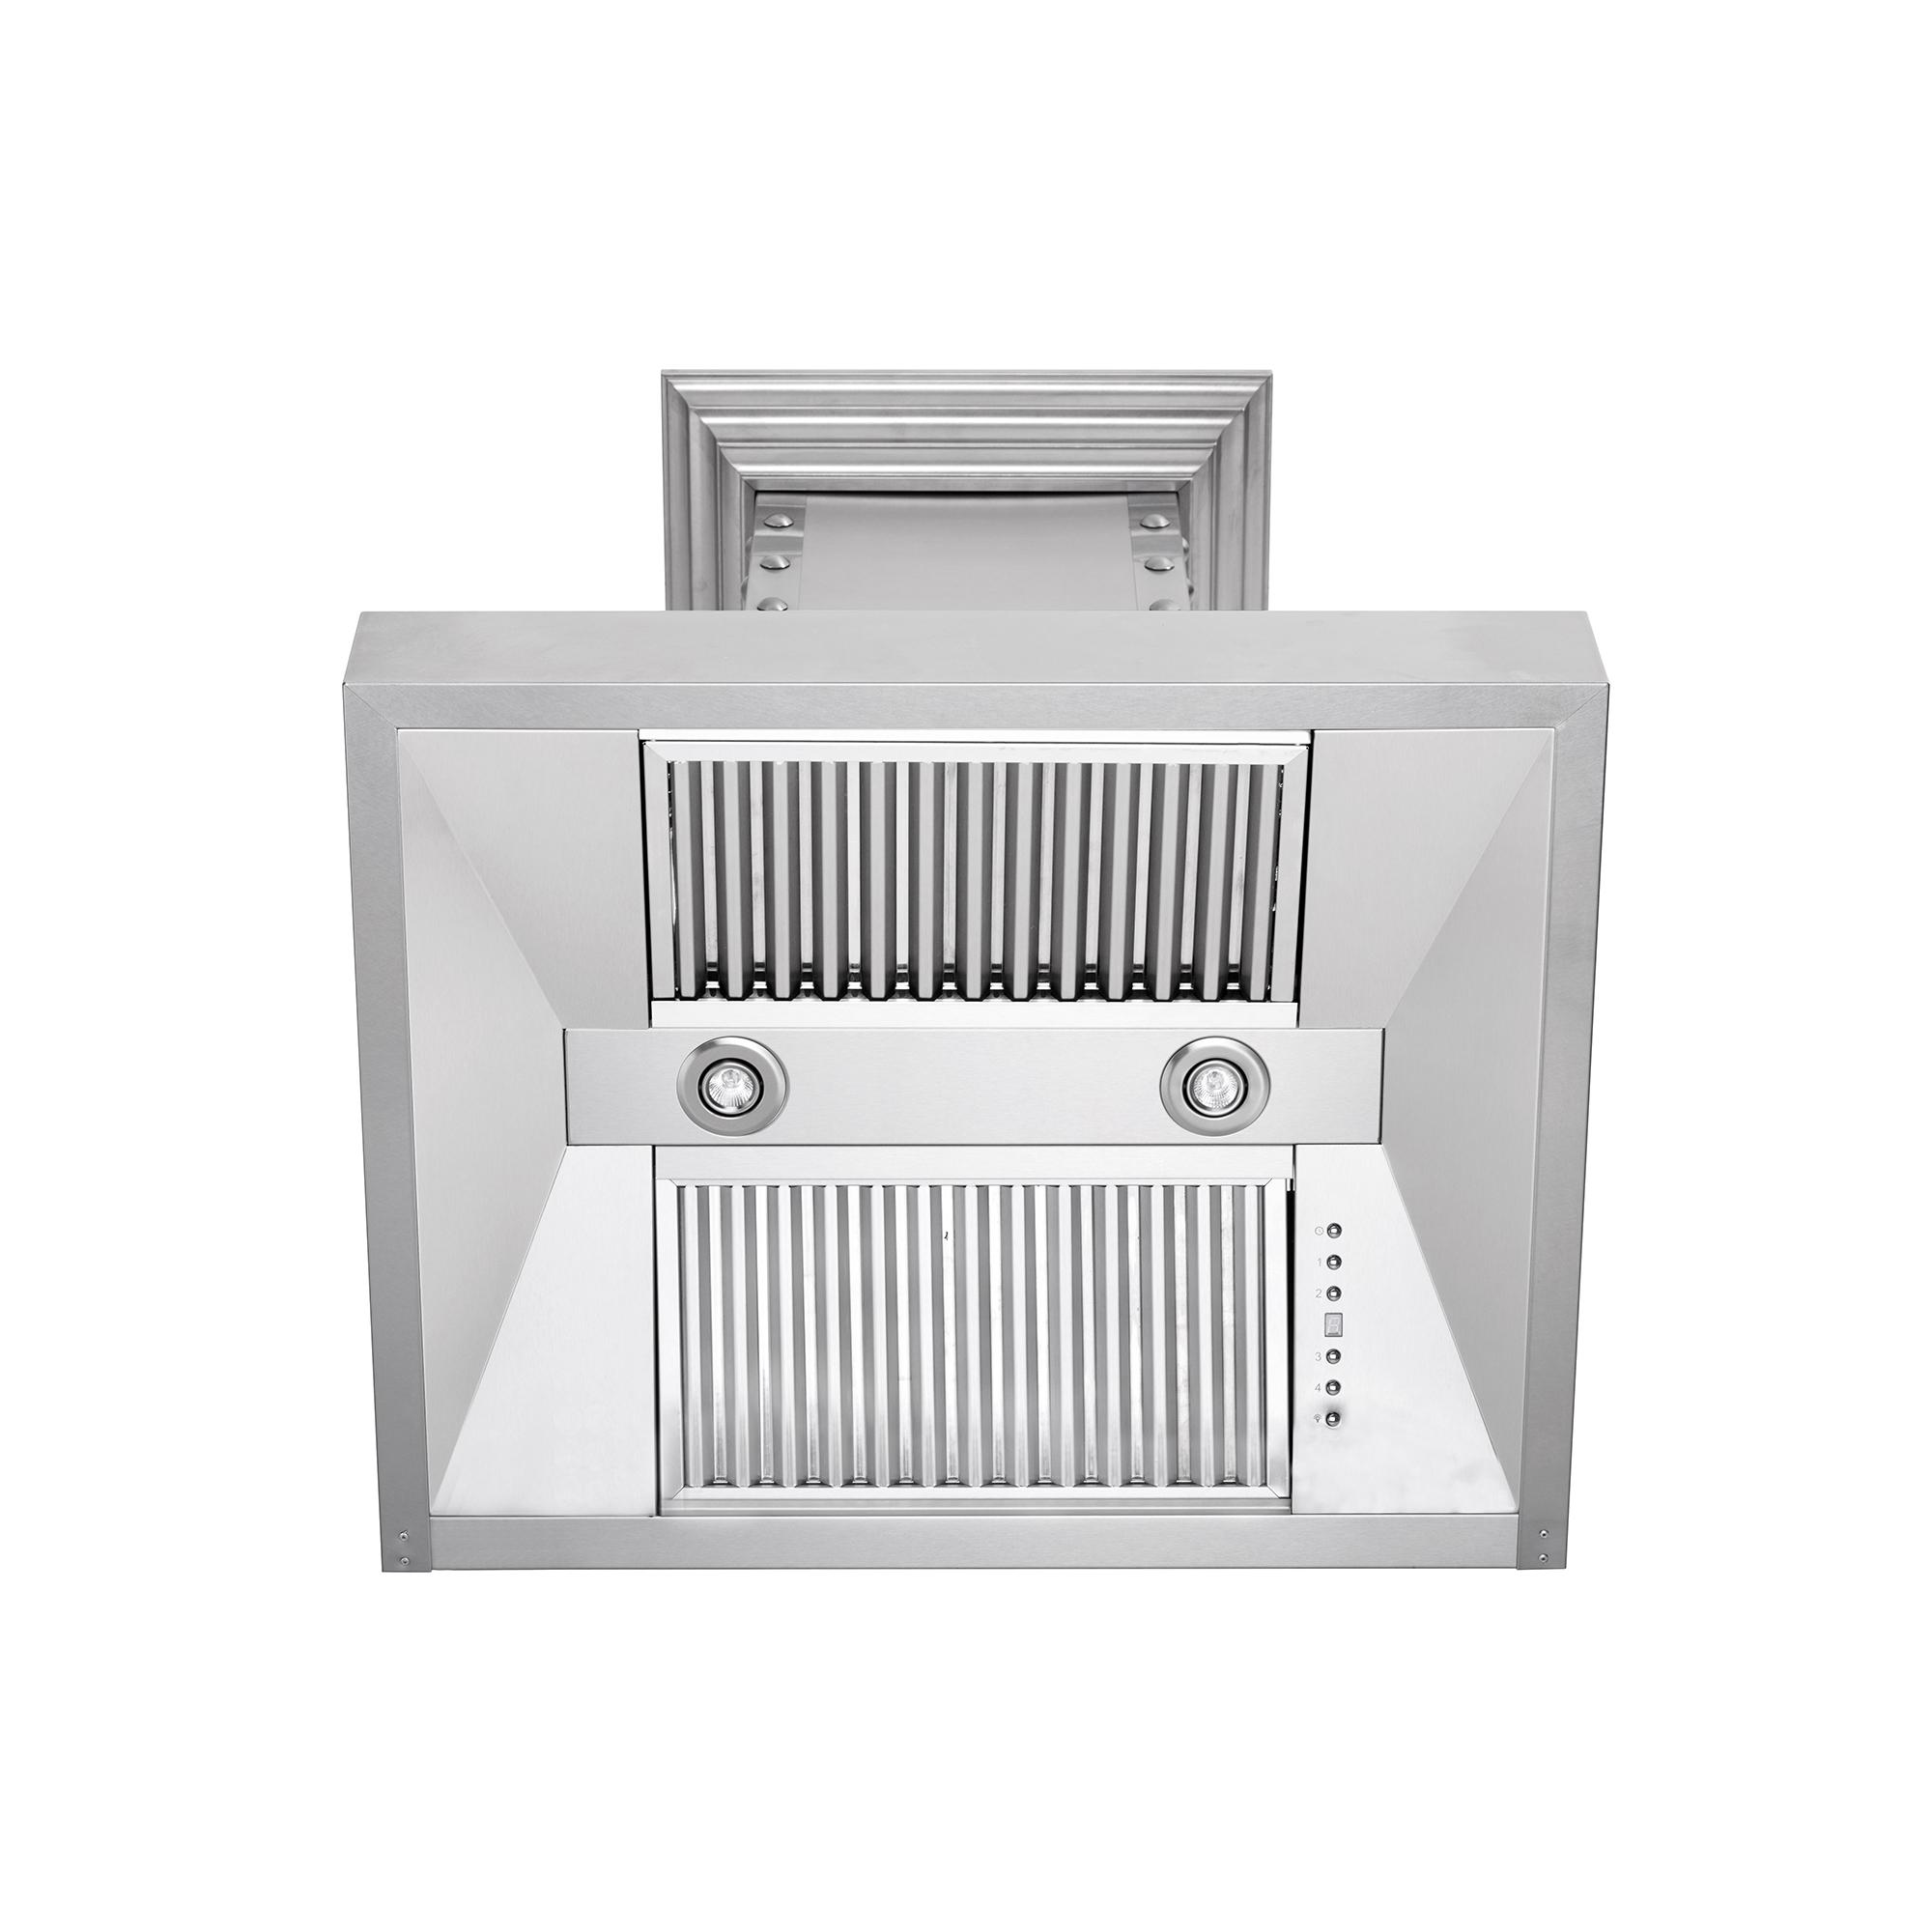 zline-stainless-steel-wall-mounted-range-hood-655-4SSSS-underneath.jpg